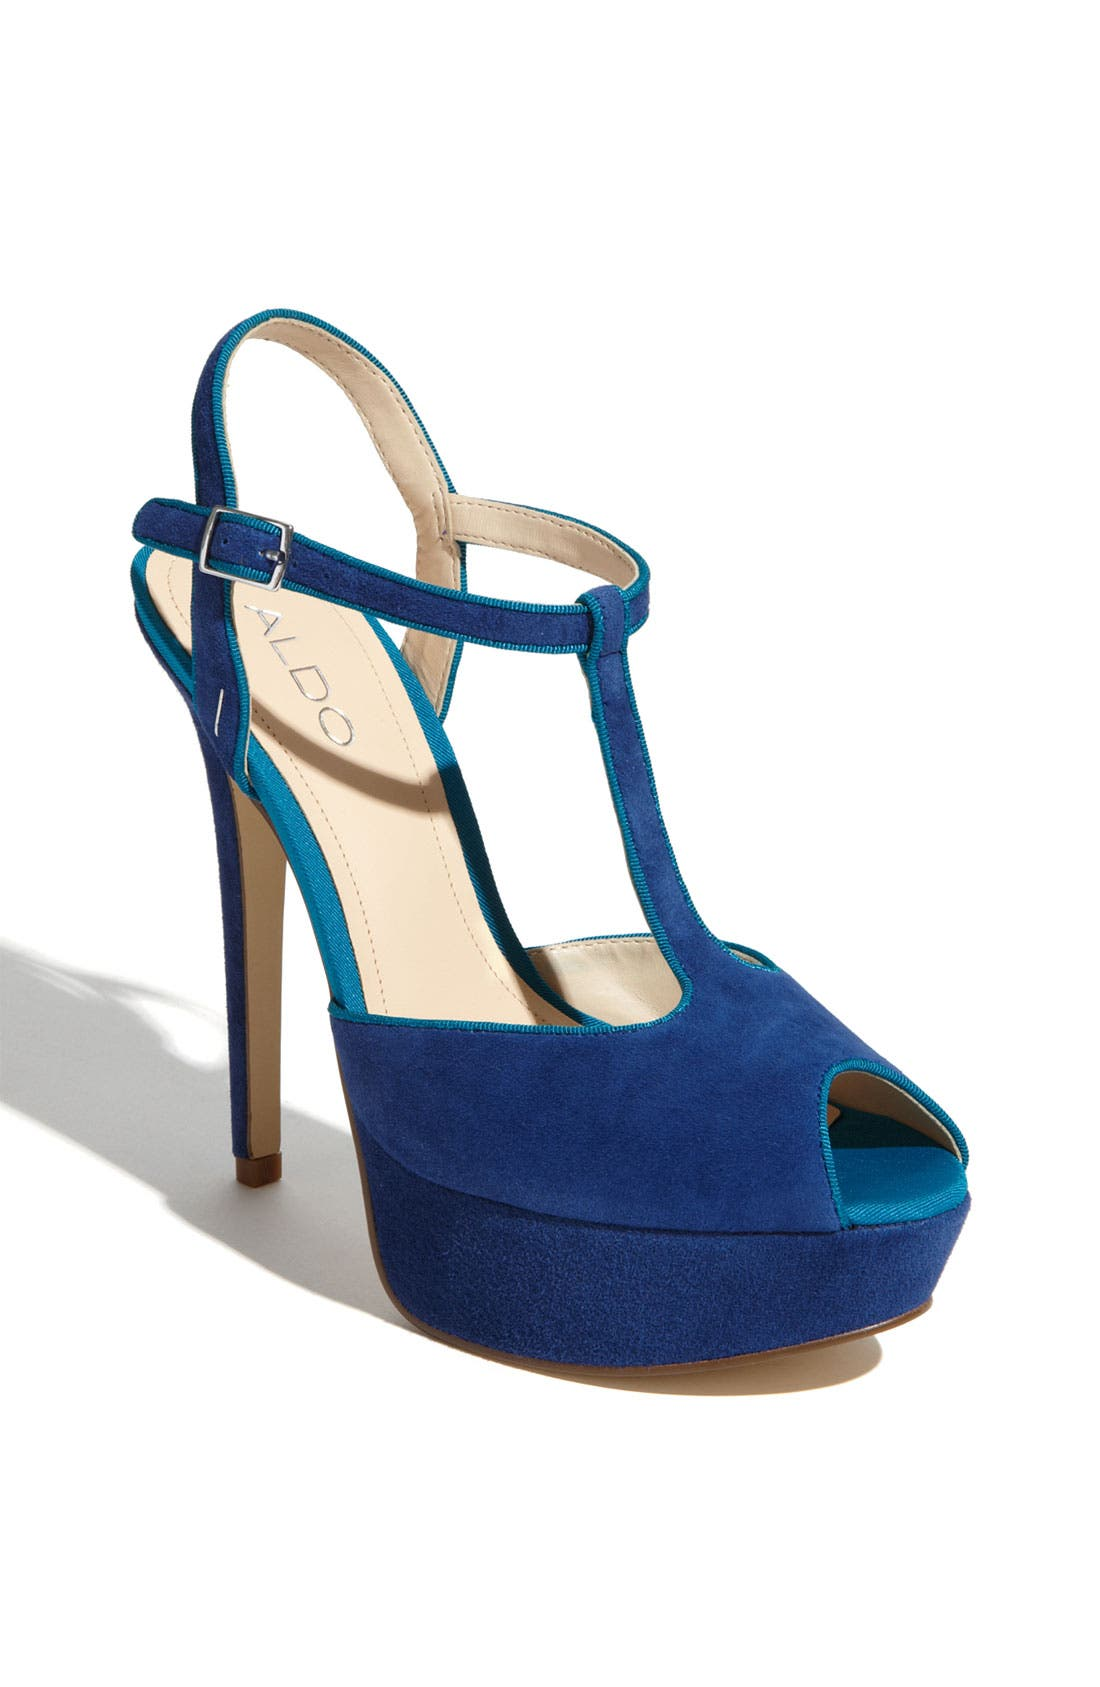 Alternate Image 1 Selected - ALDO 'Detamble' Sandal